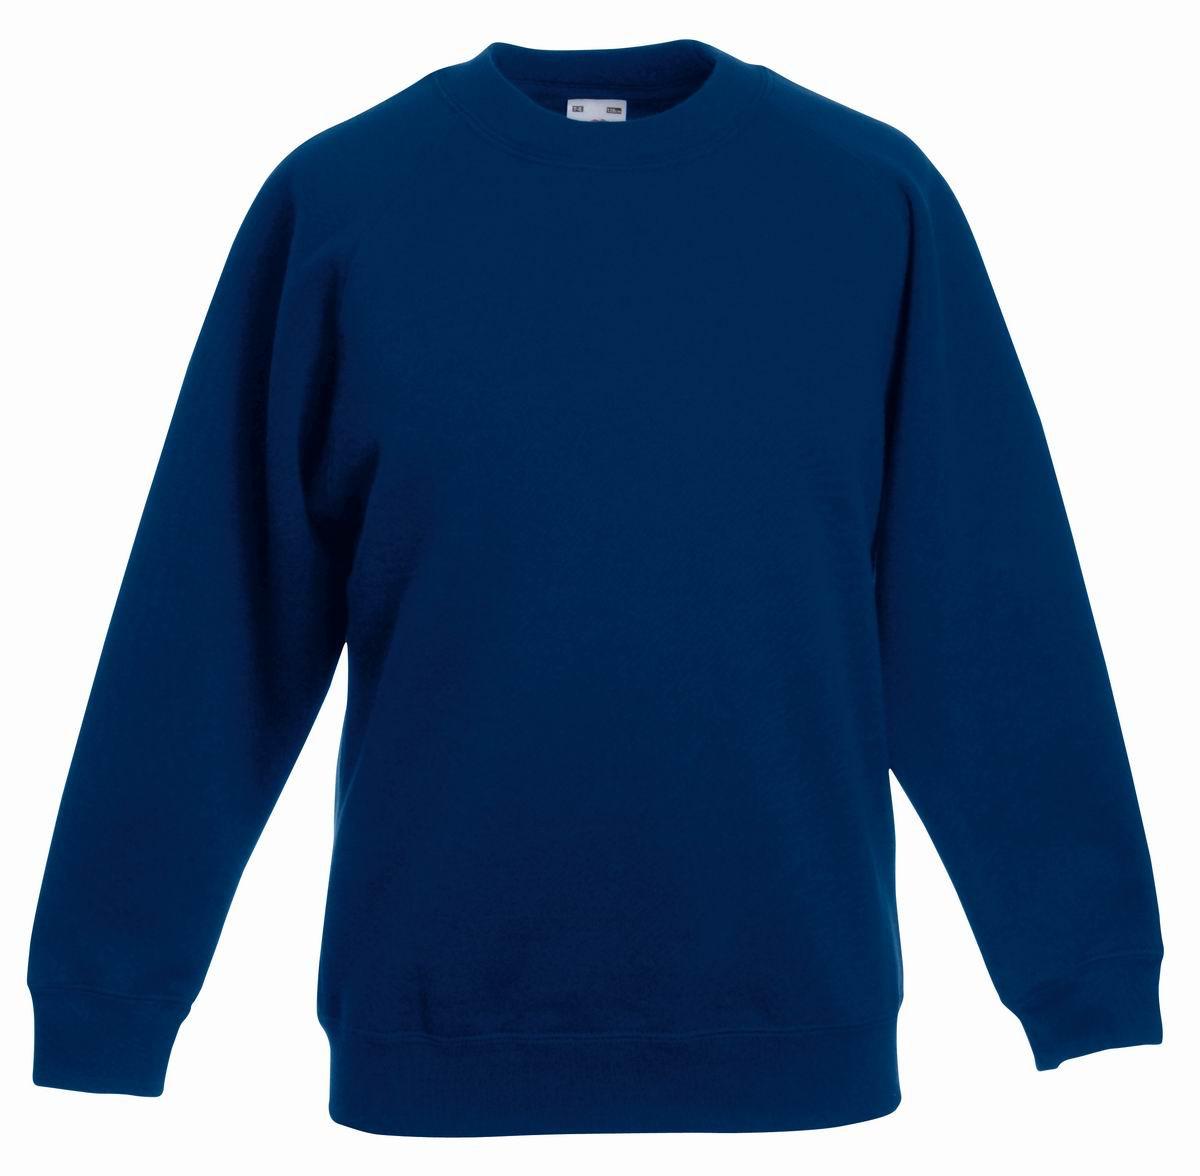 Толстовка детская Classic Kids Raglan Sweat, рост 152 (12-13лет), Тёмно-синий